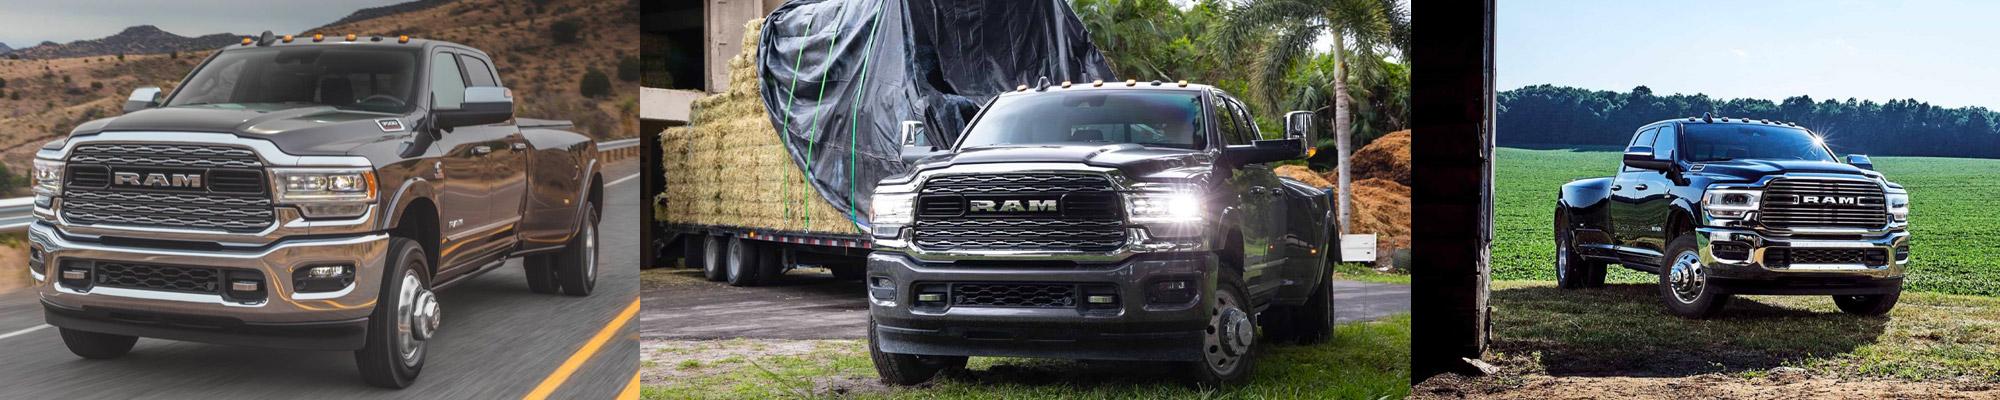 2020 Ram 3500 towing capacity